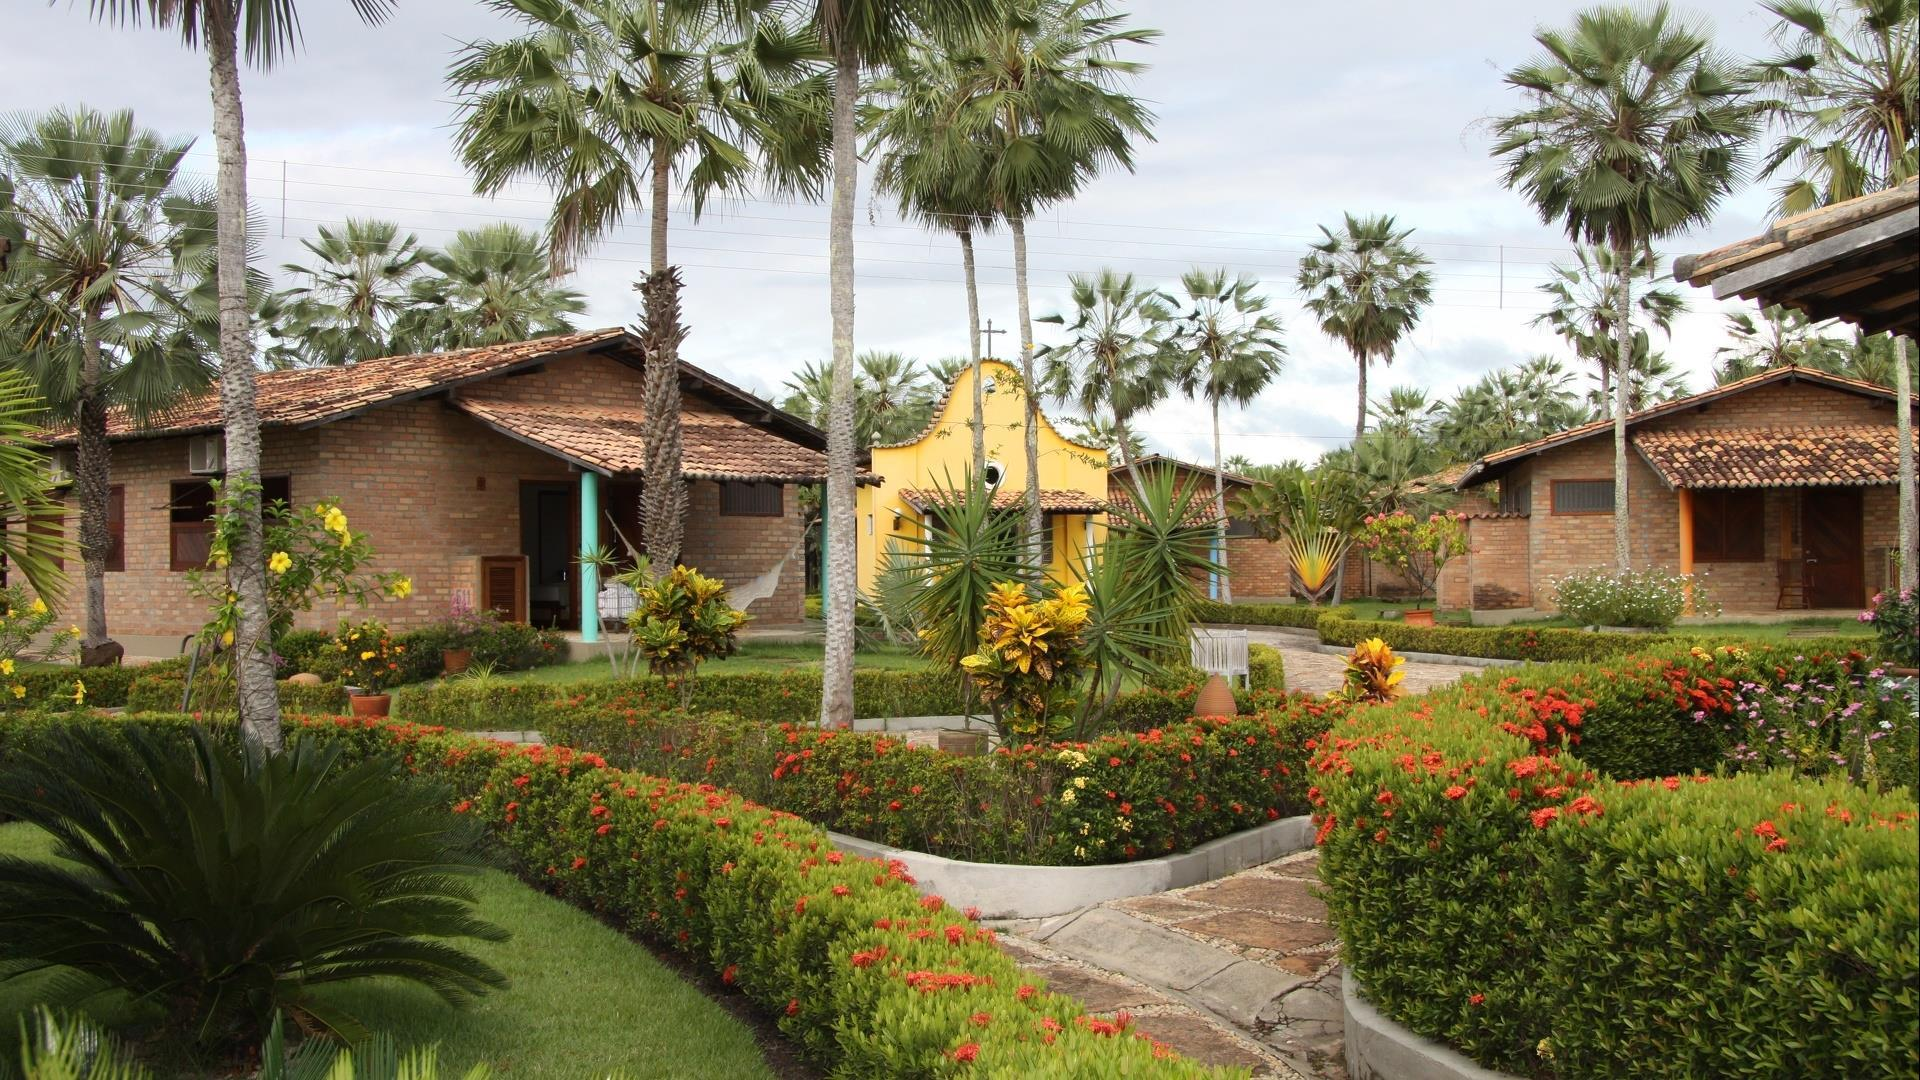 Brasilien Lencois Maranhenses: Superior Hotel - Hotel Porto Preguicas Resort